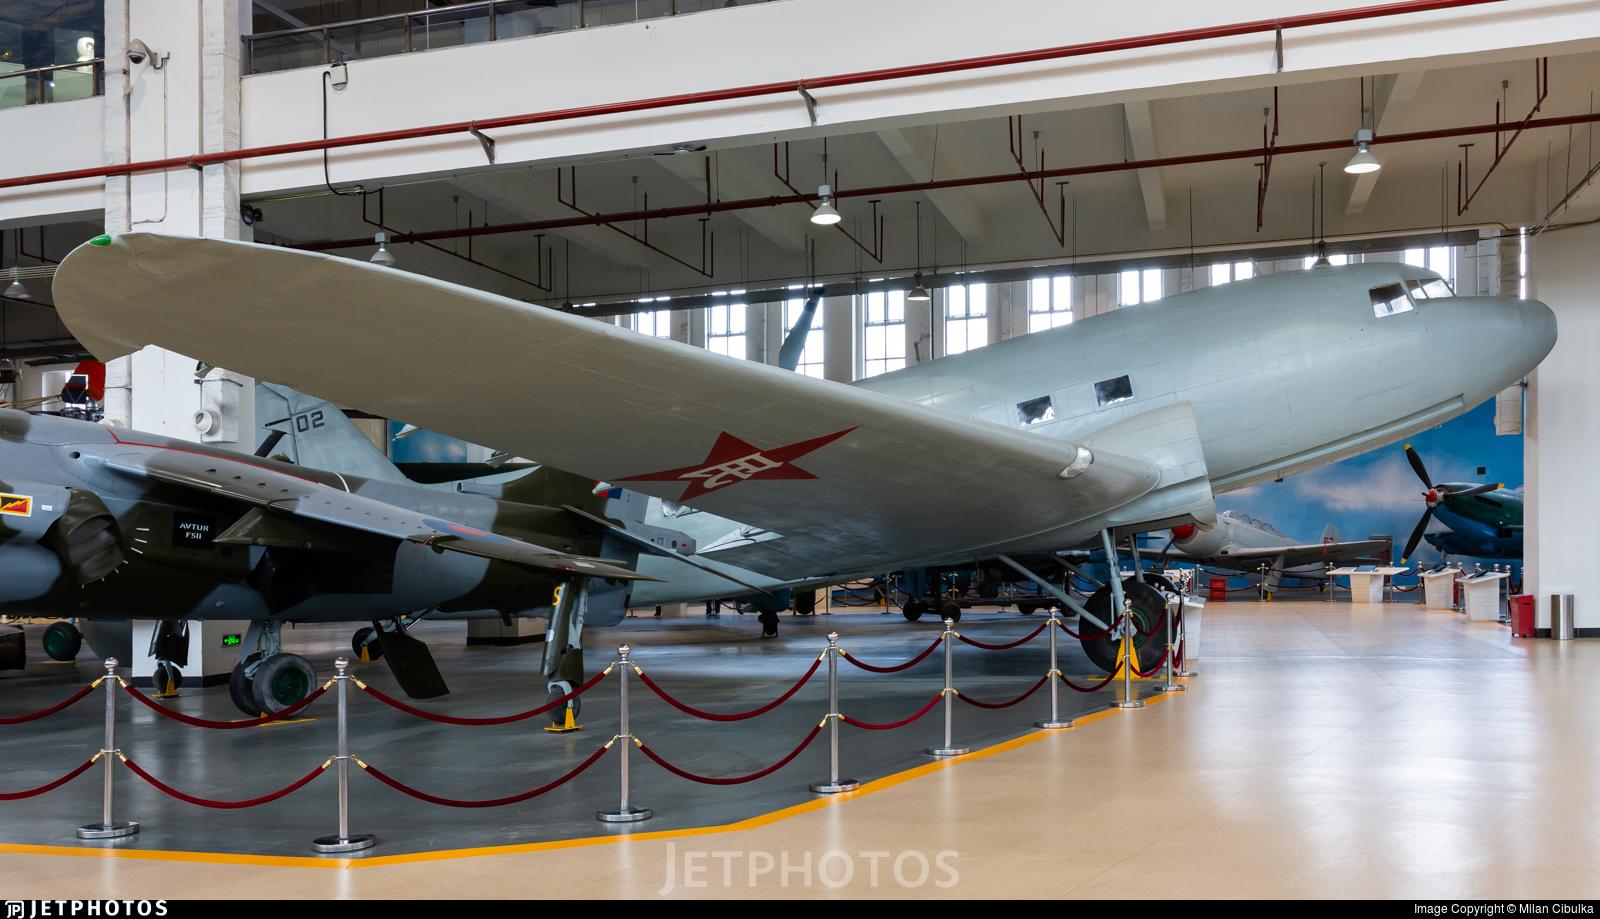 102 - Douglas C-47B Skytrain - China - Air Force